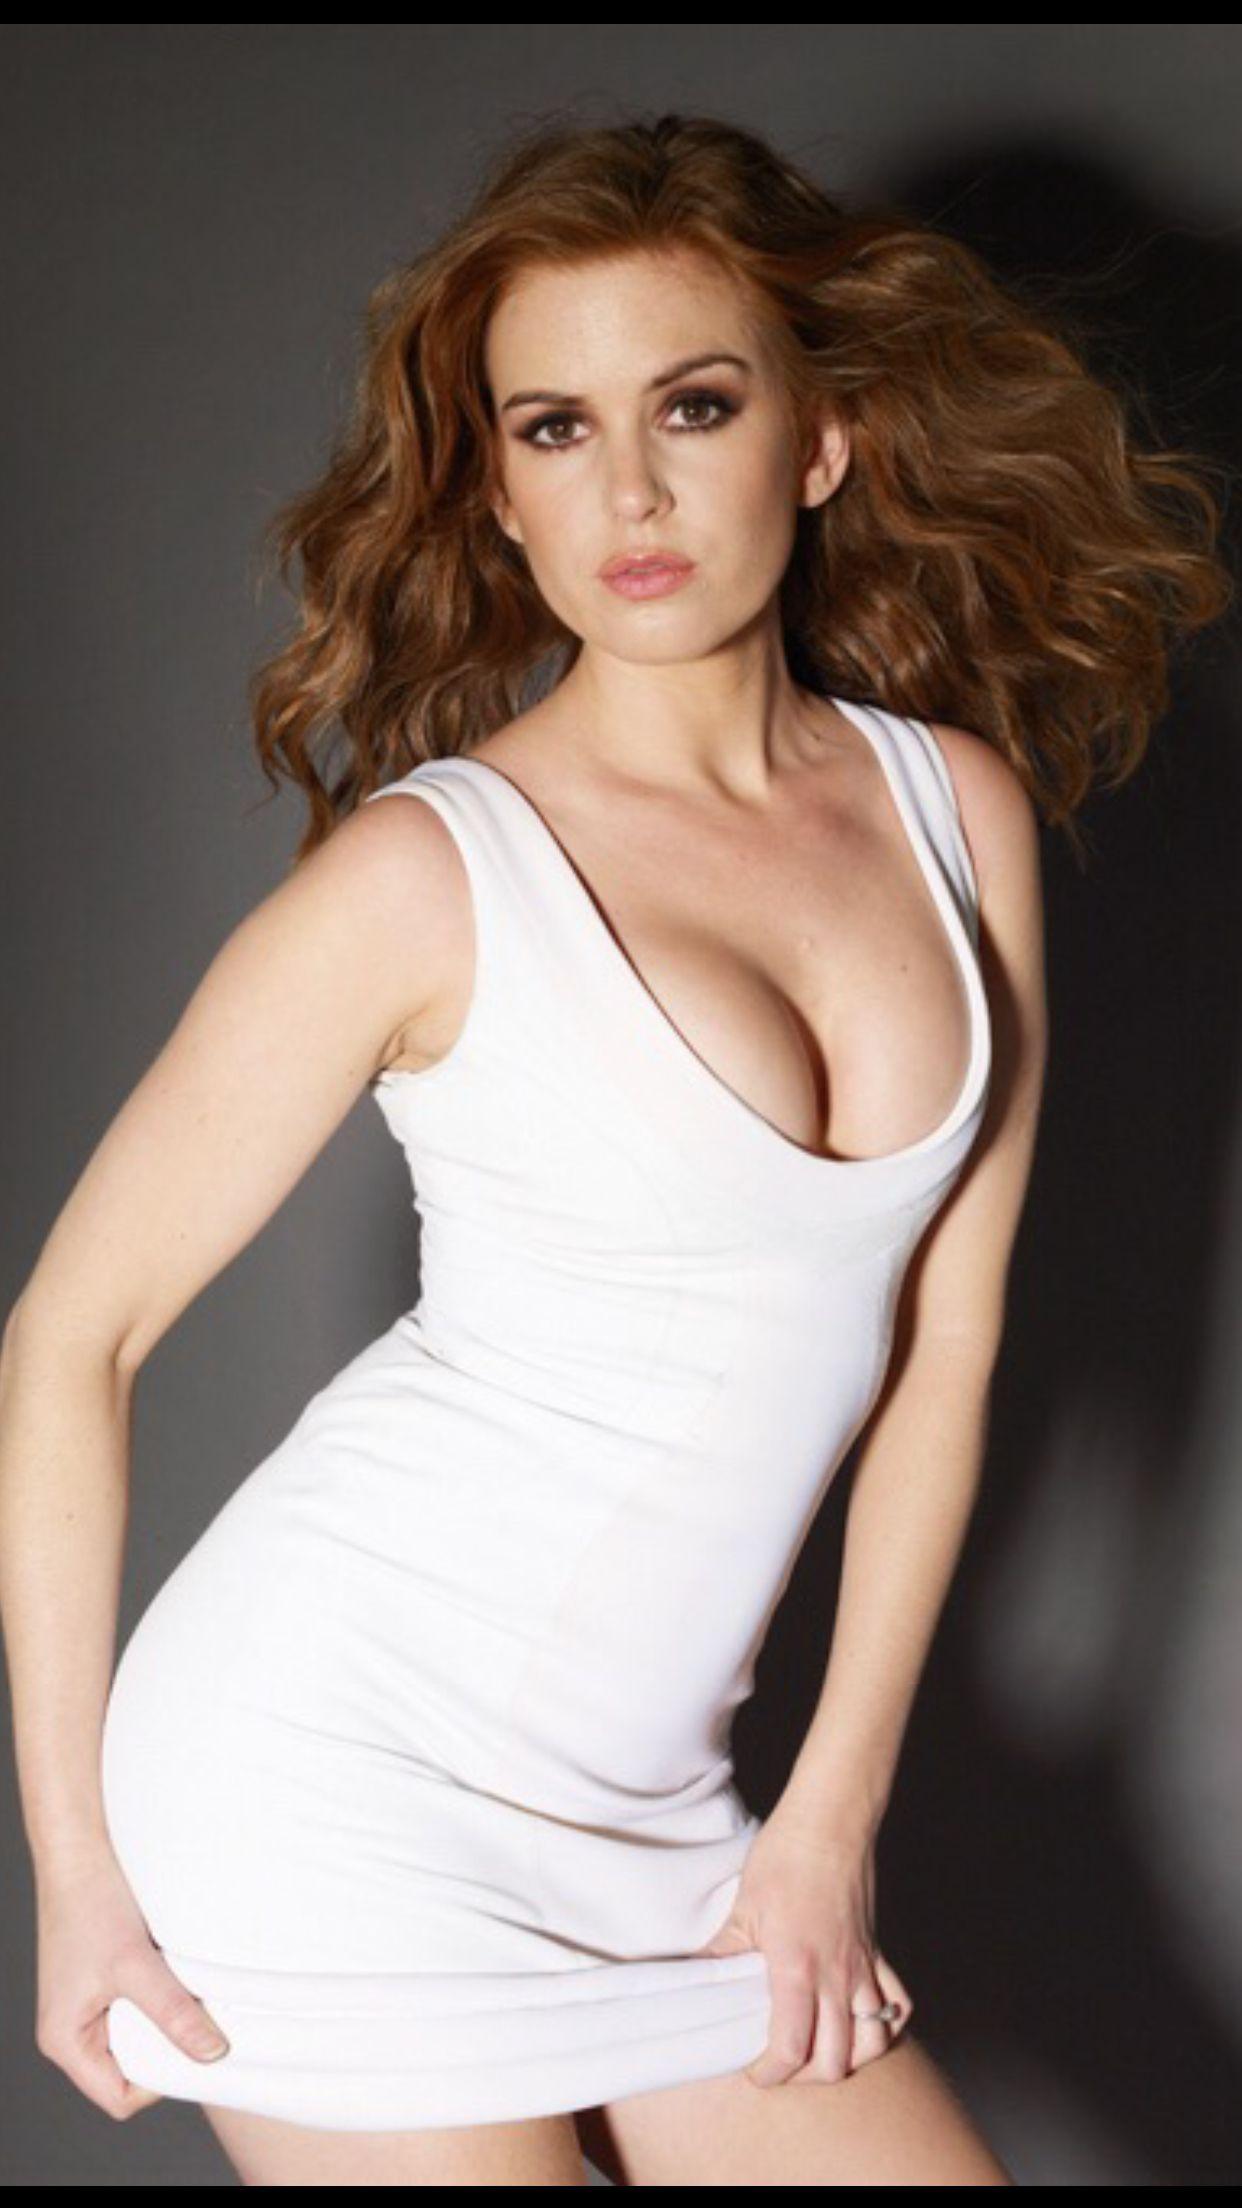 fisher actress hot Isla